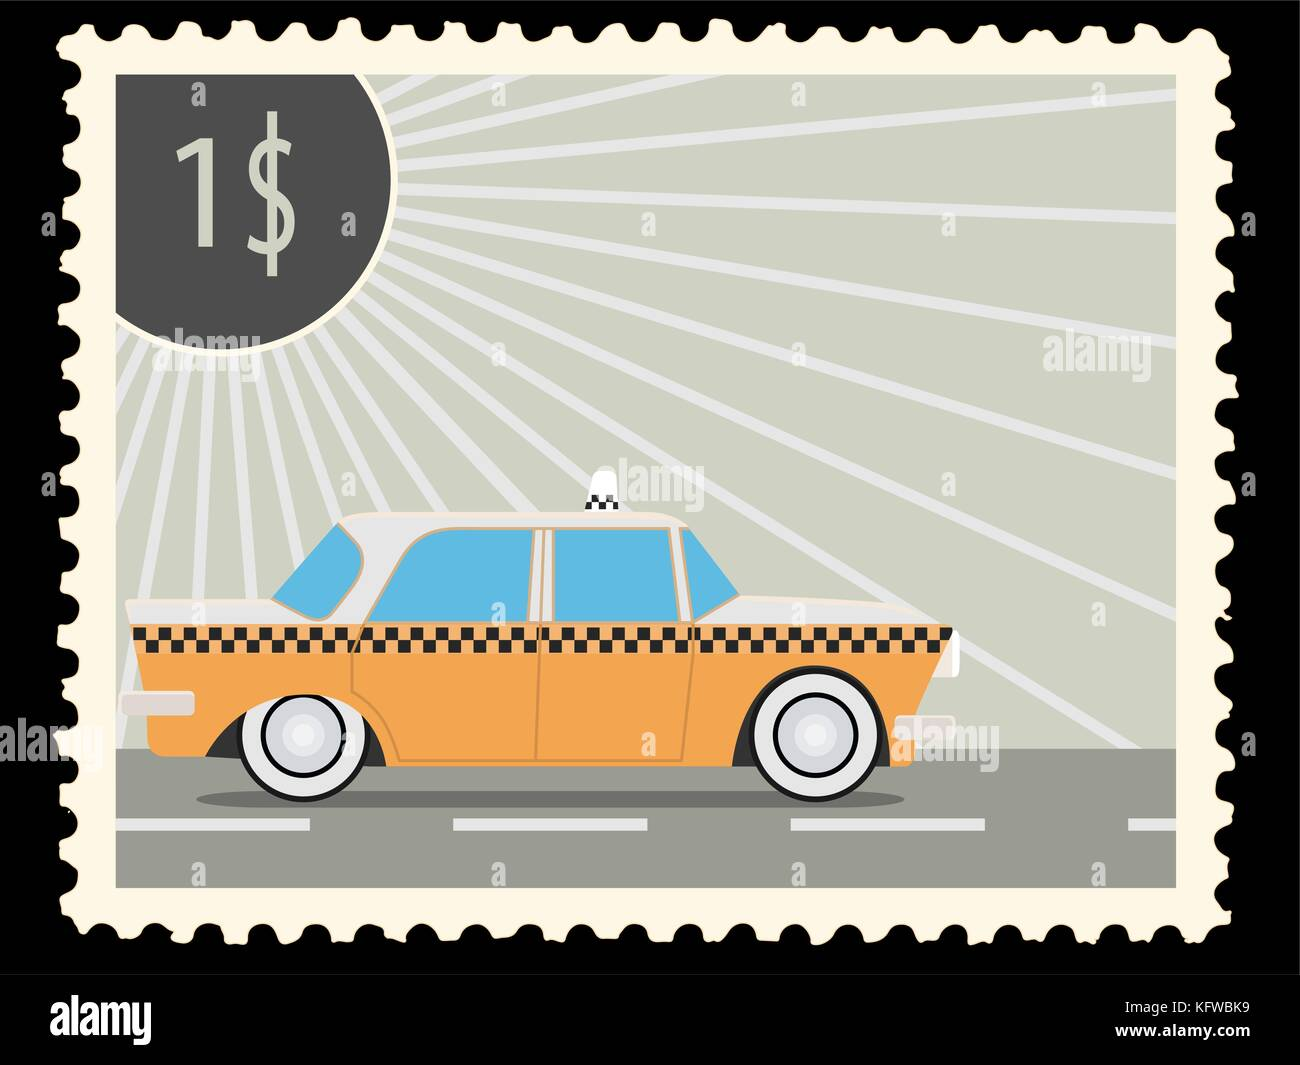 Briefmarke mit retro Taxi Autos. Vector Illustration Stockbild